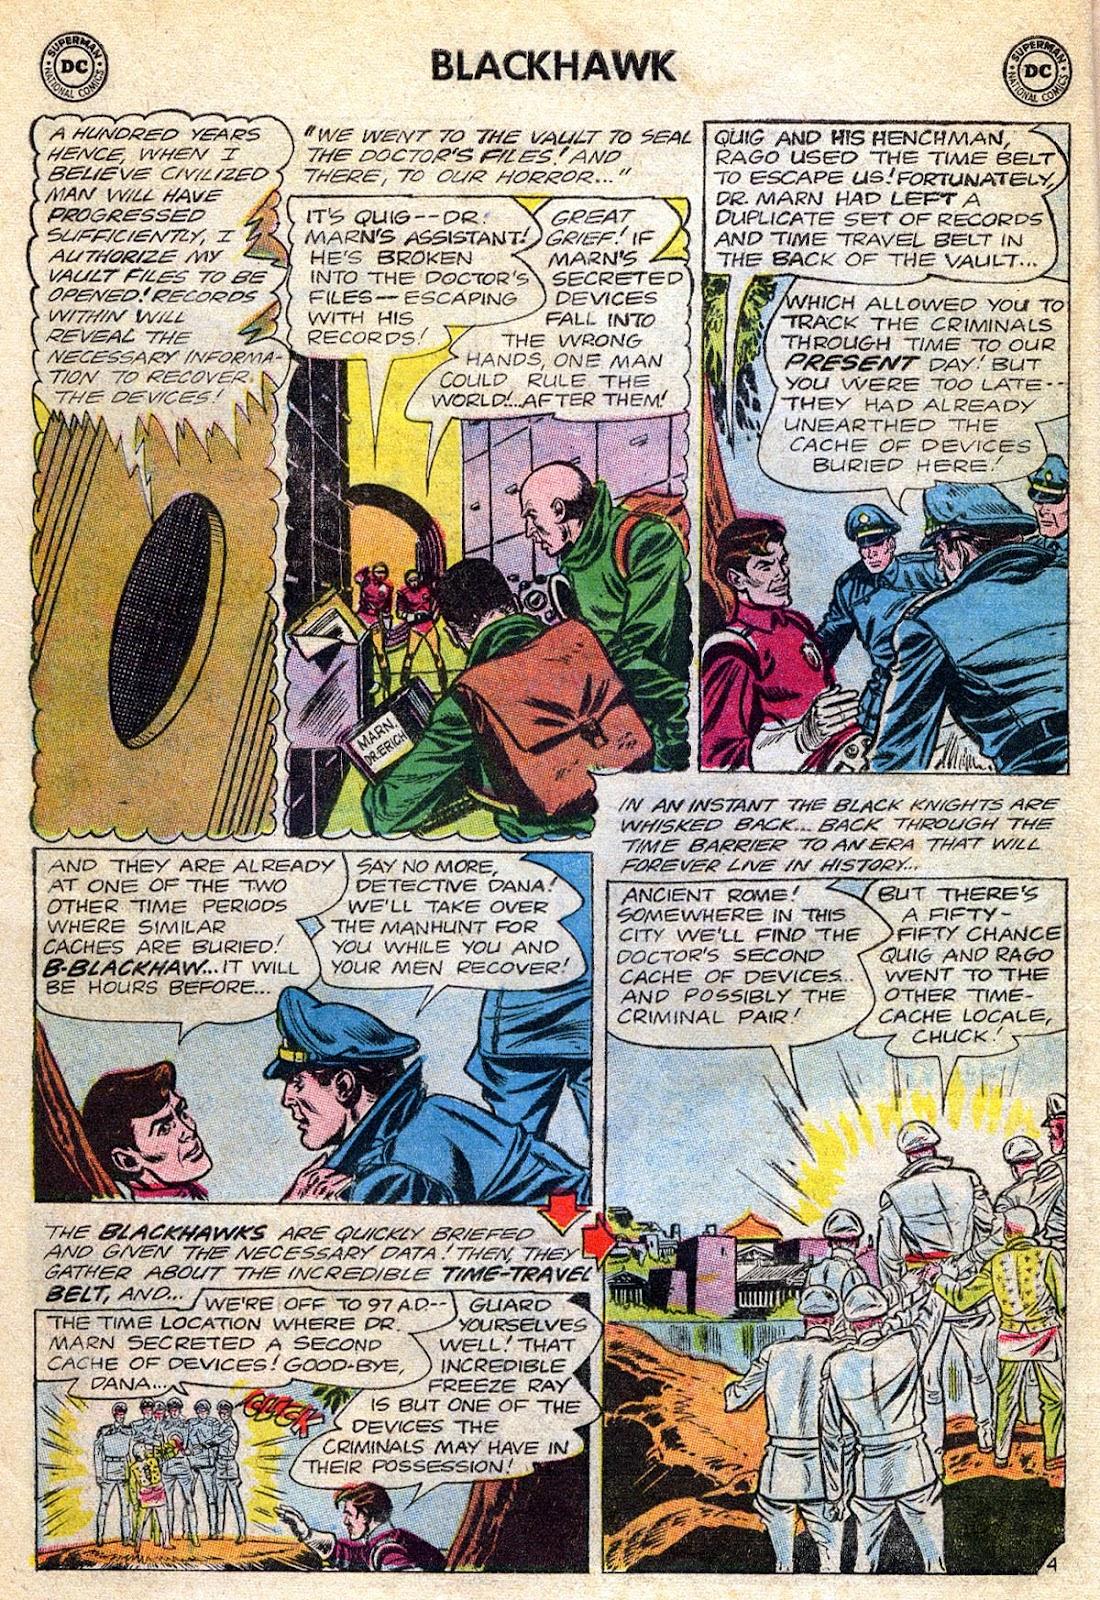 Blackhawk (1957) Issue #189 #82 - English 6